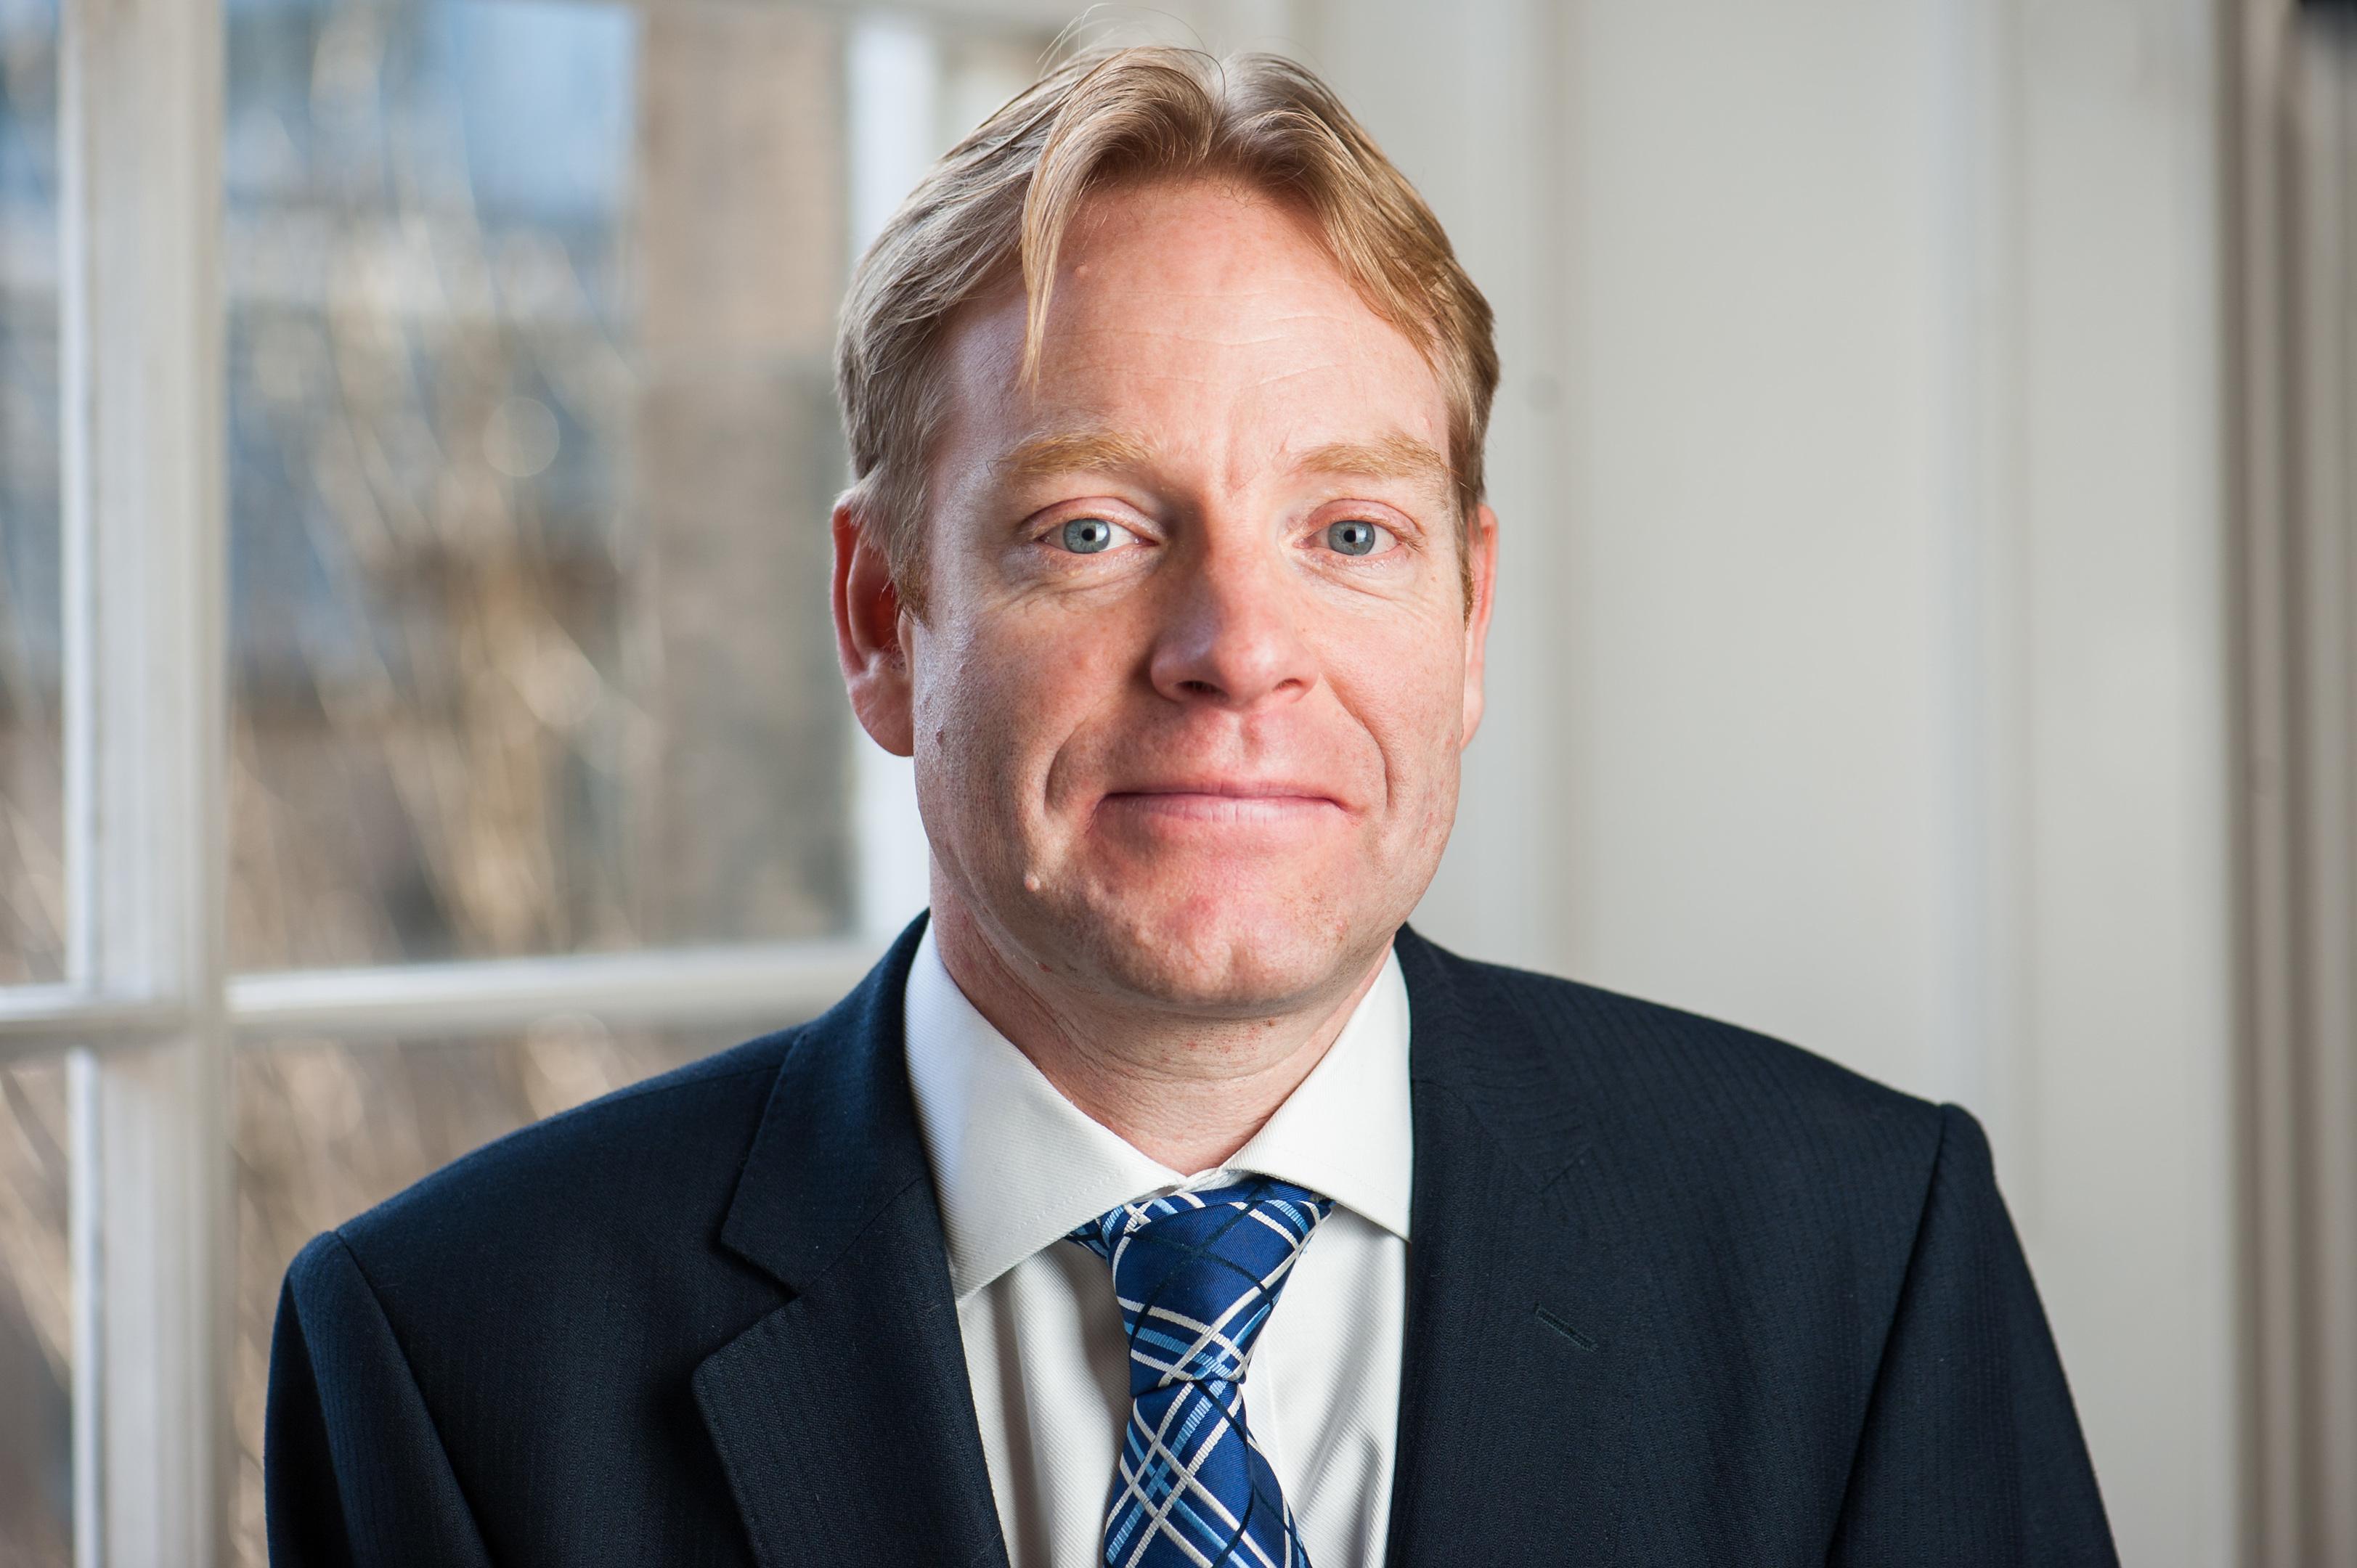 Simon Williams, legal director at Gillespie Macandrew LLP